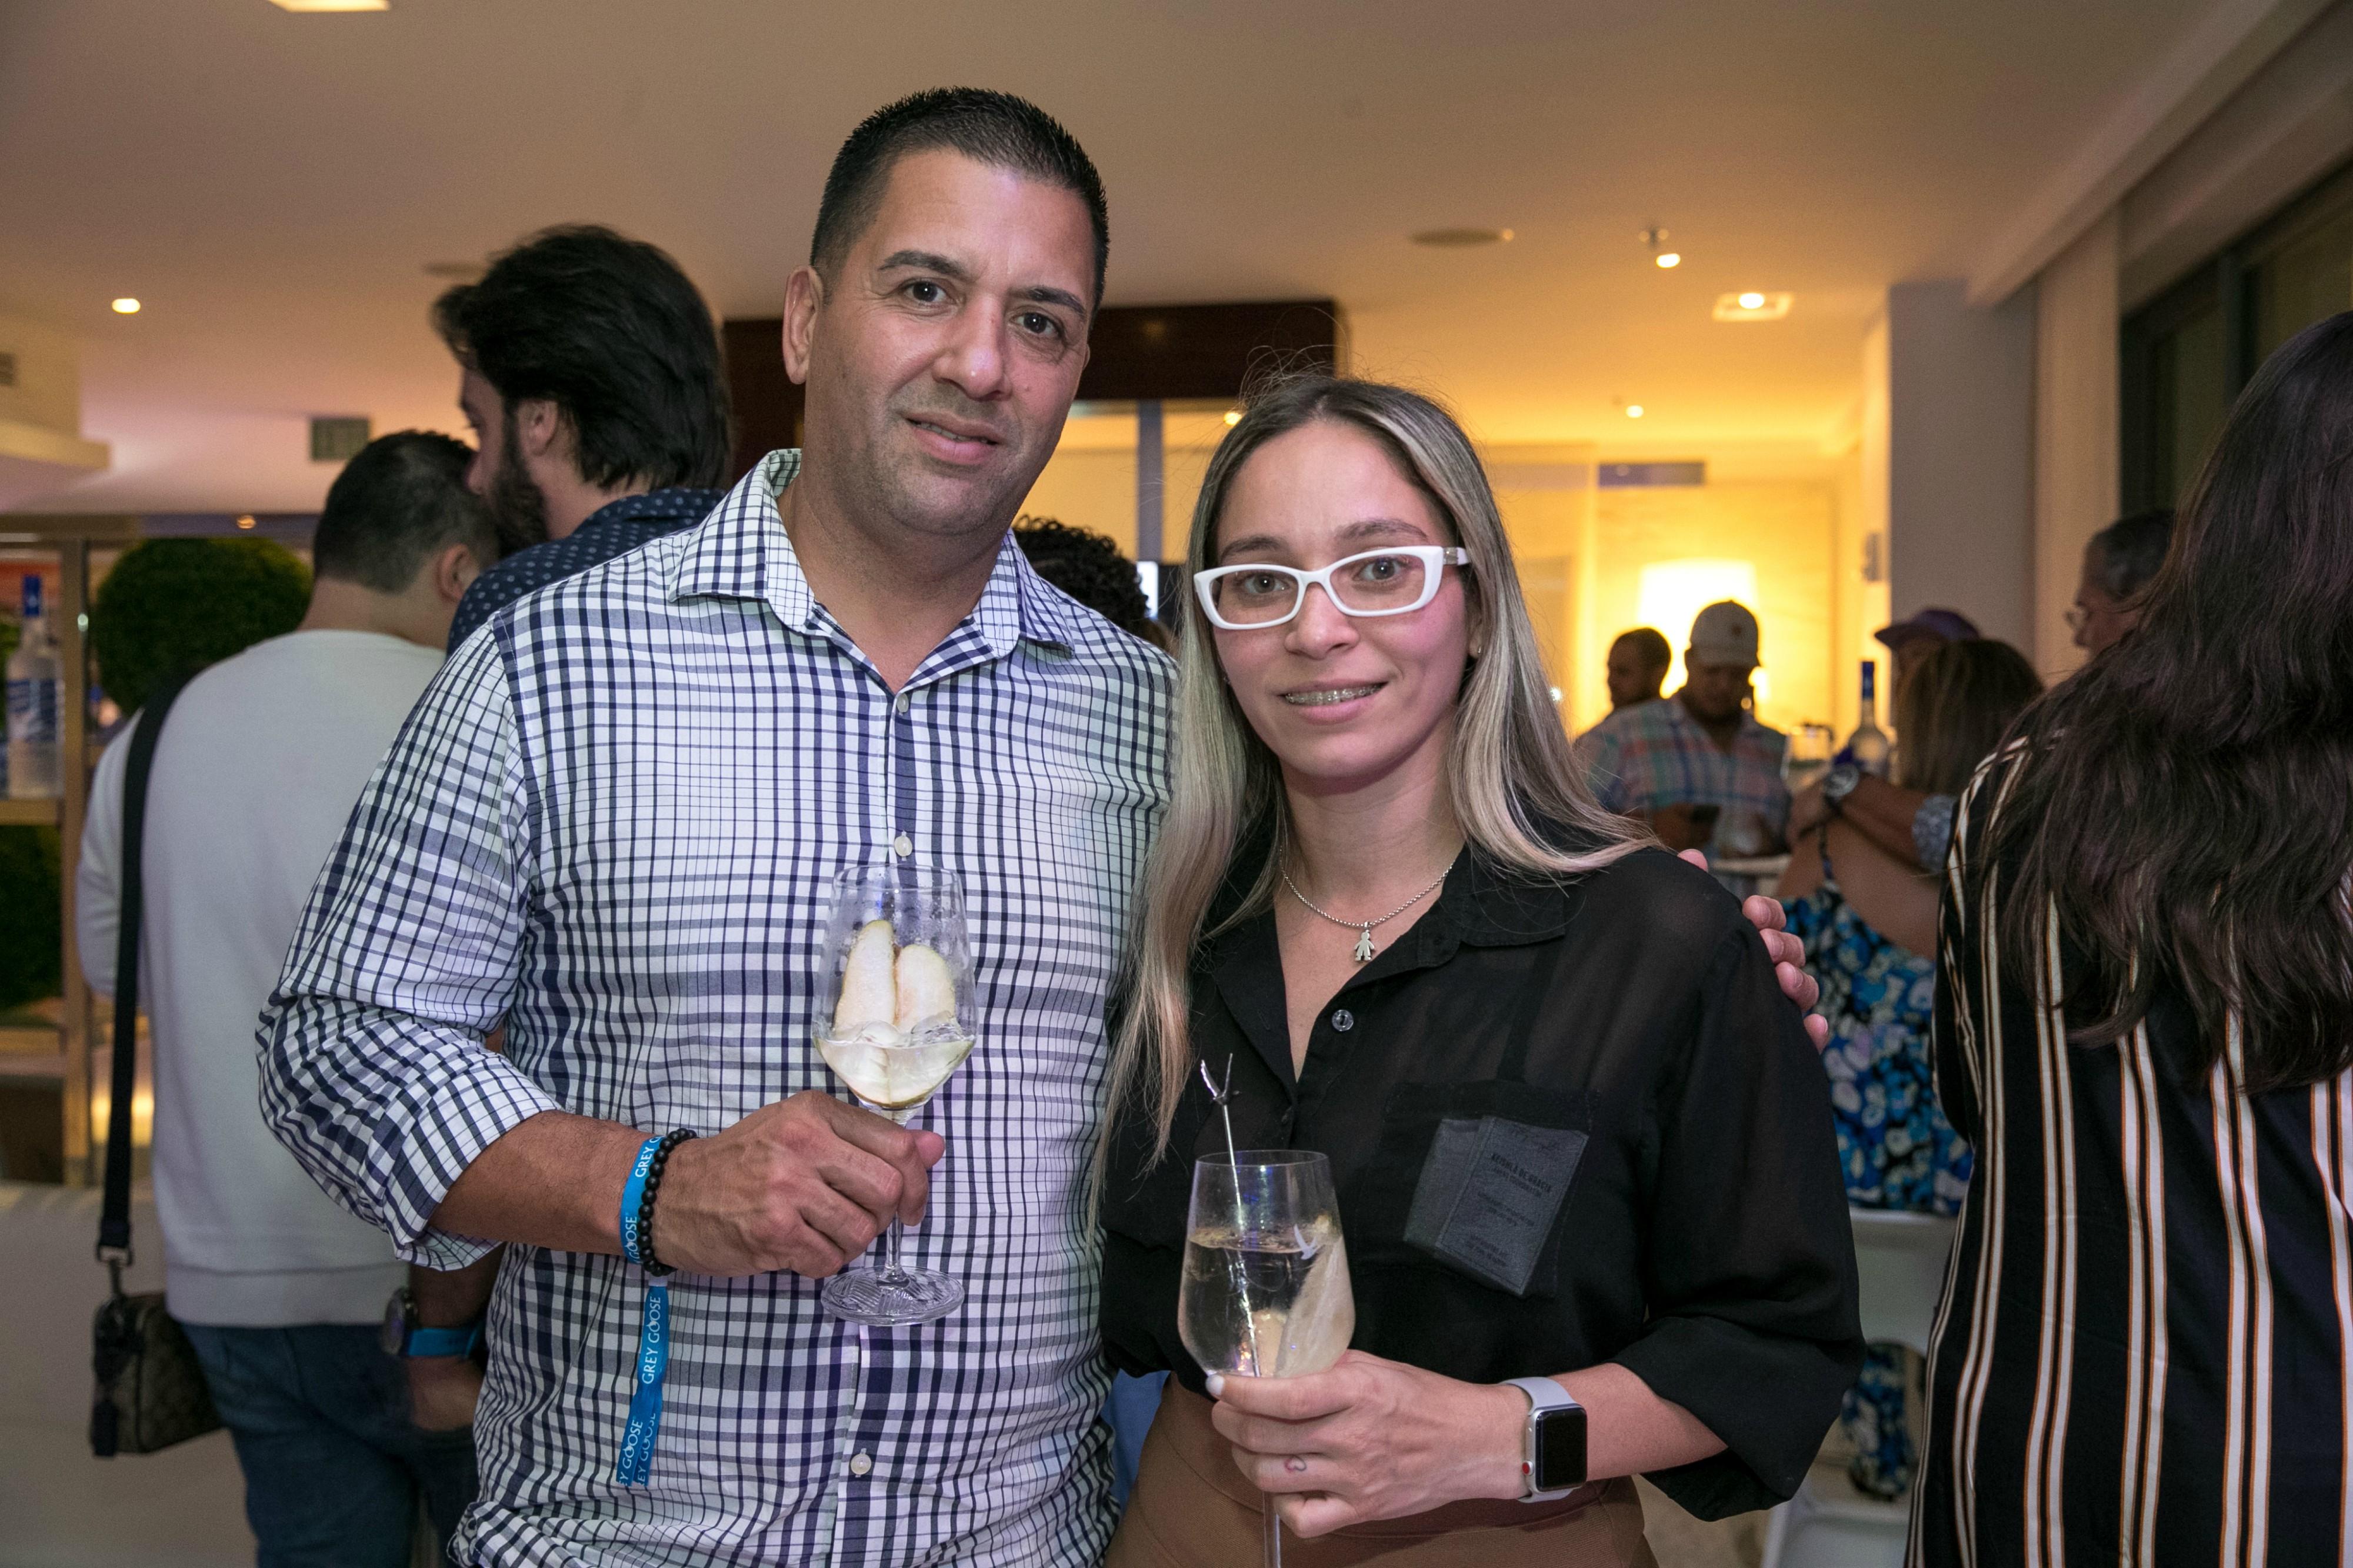 Abel Pérez y Keyshla De Gracia. (Suministrada)